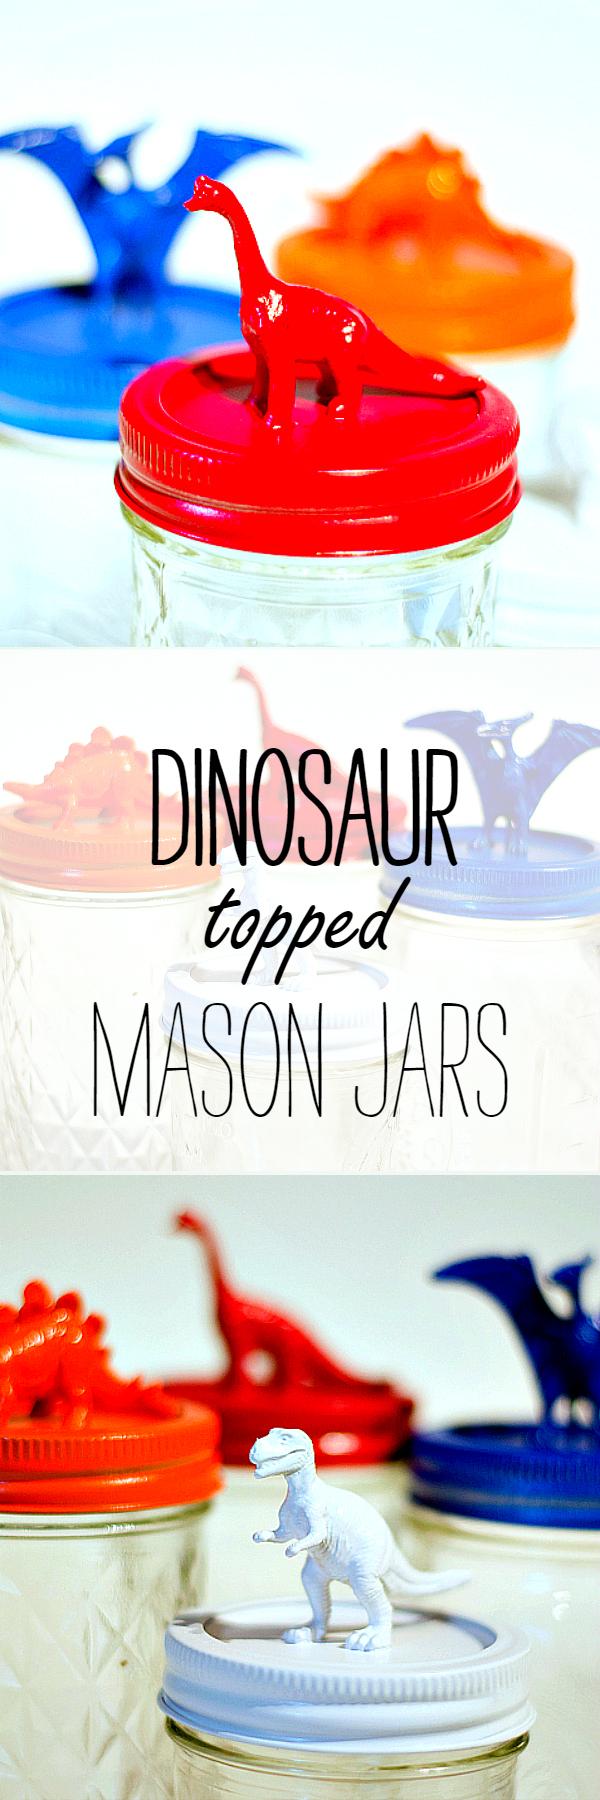 Dinosaur Topped Mason Jars